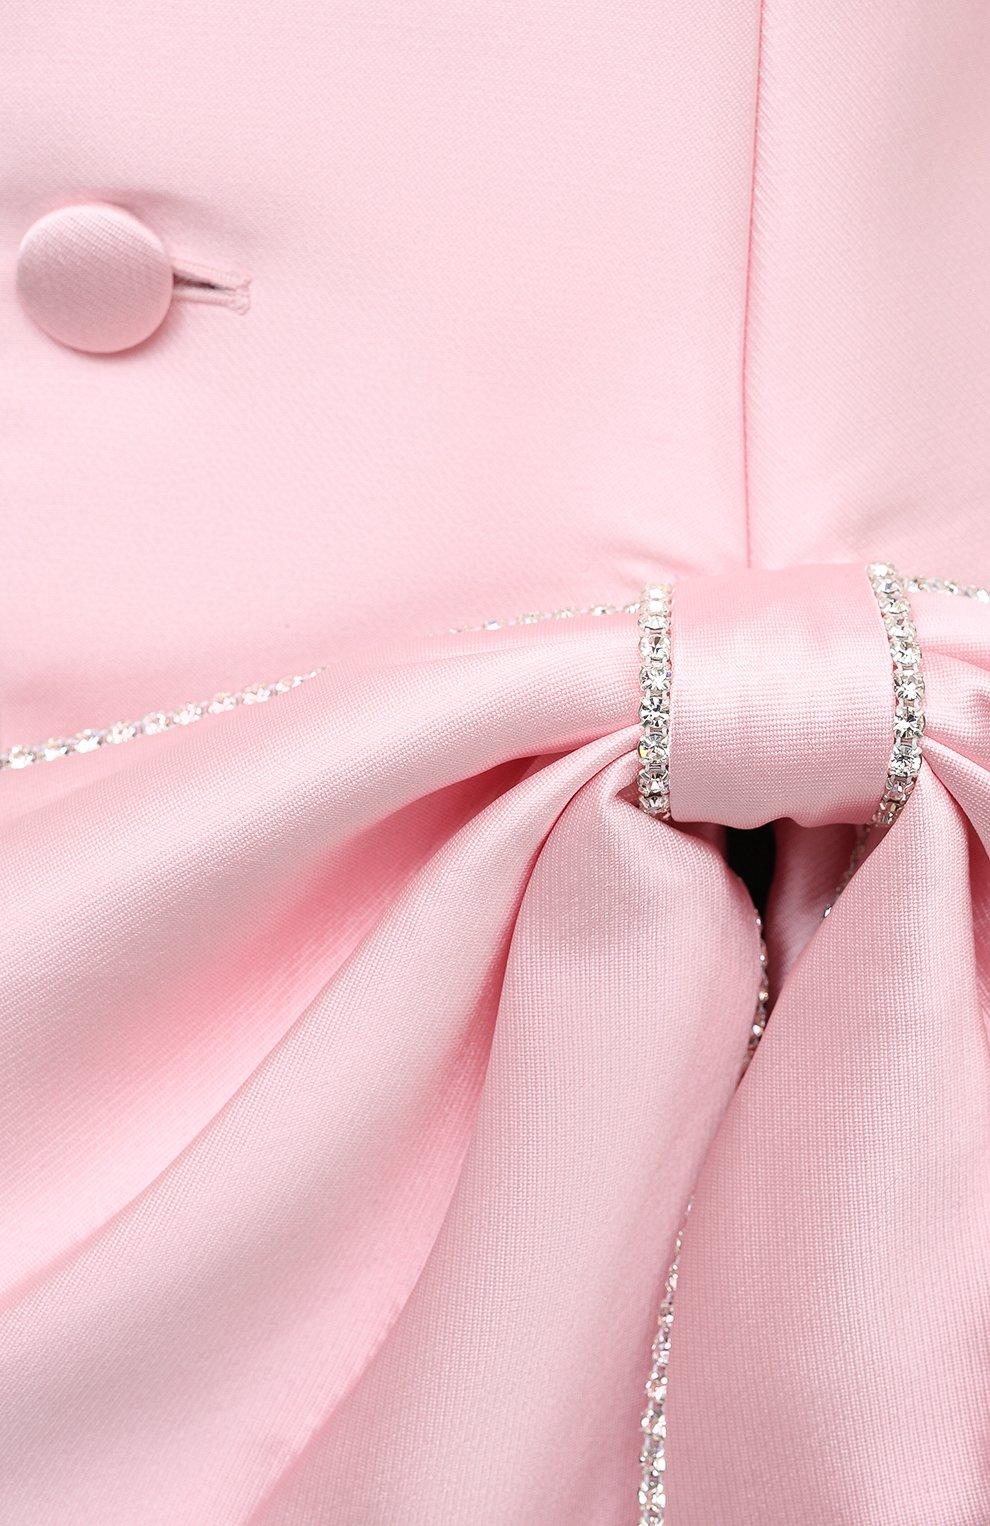 Женский жакет AREA светло-розового цвета, арт. PF20J03084 | Фото 5